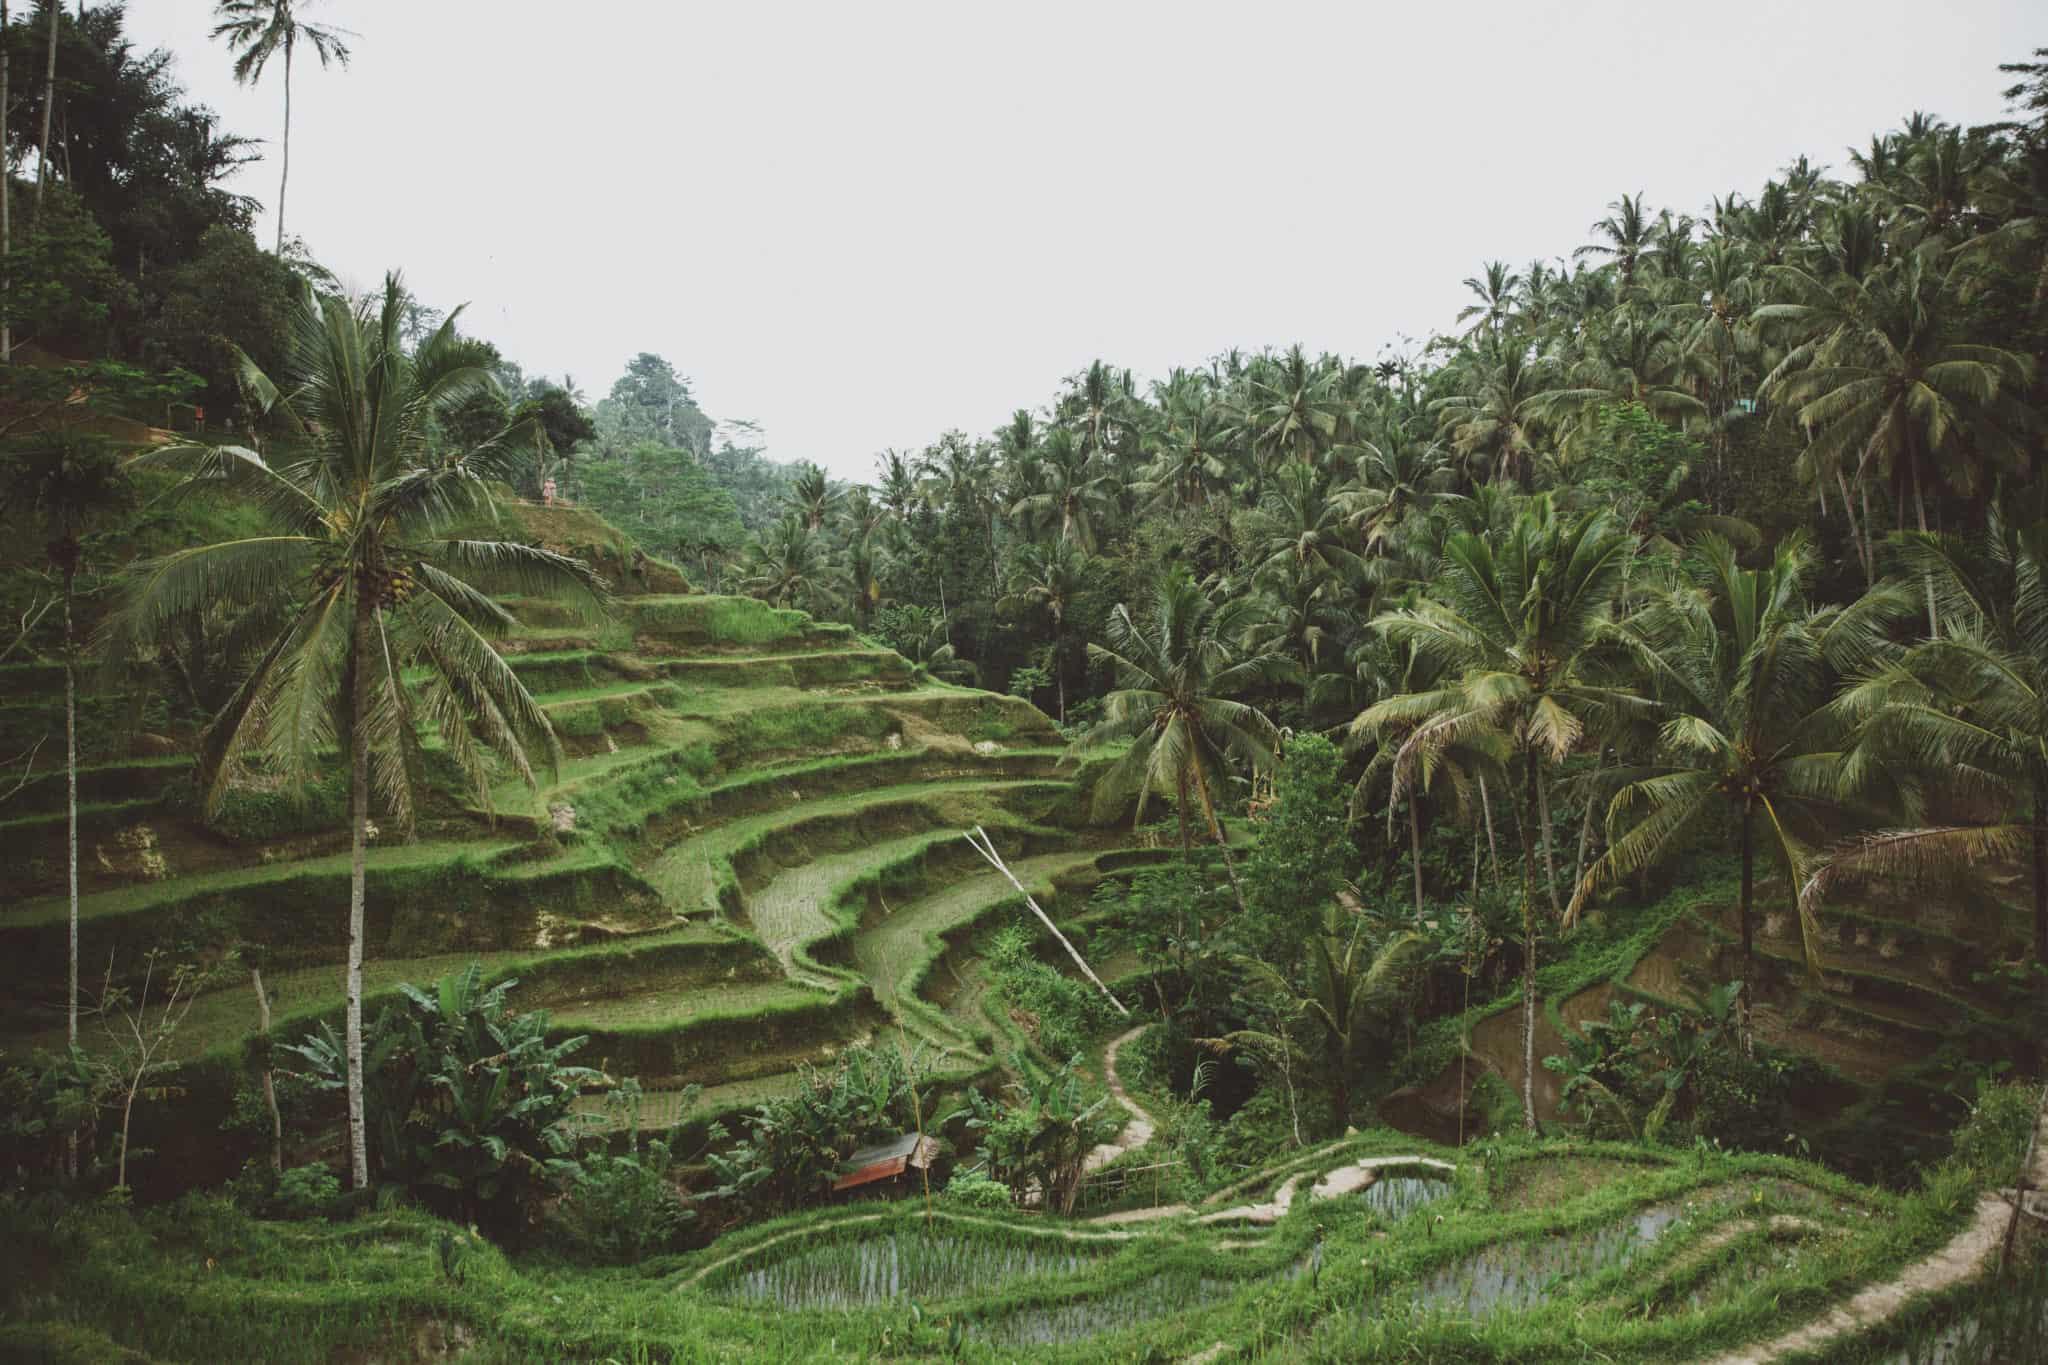 bali-Tegallalang Rice fields